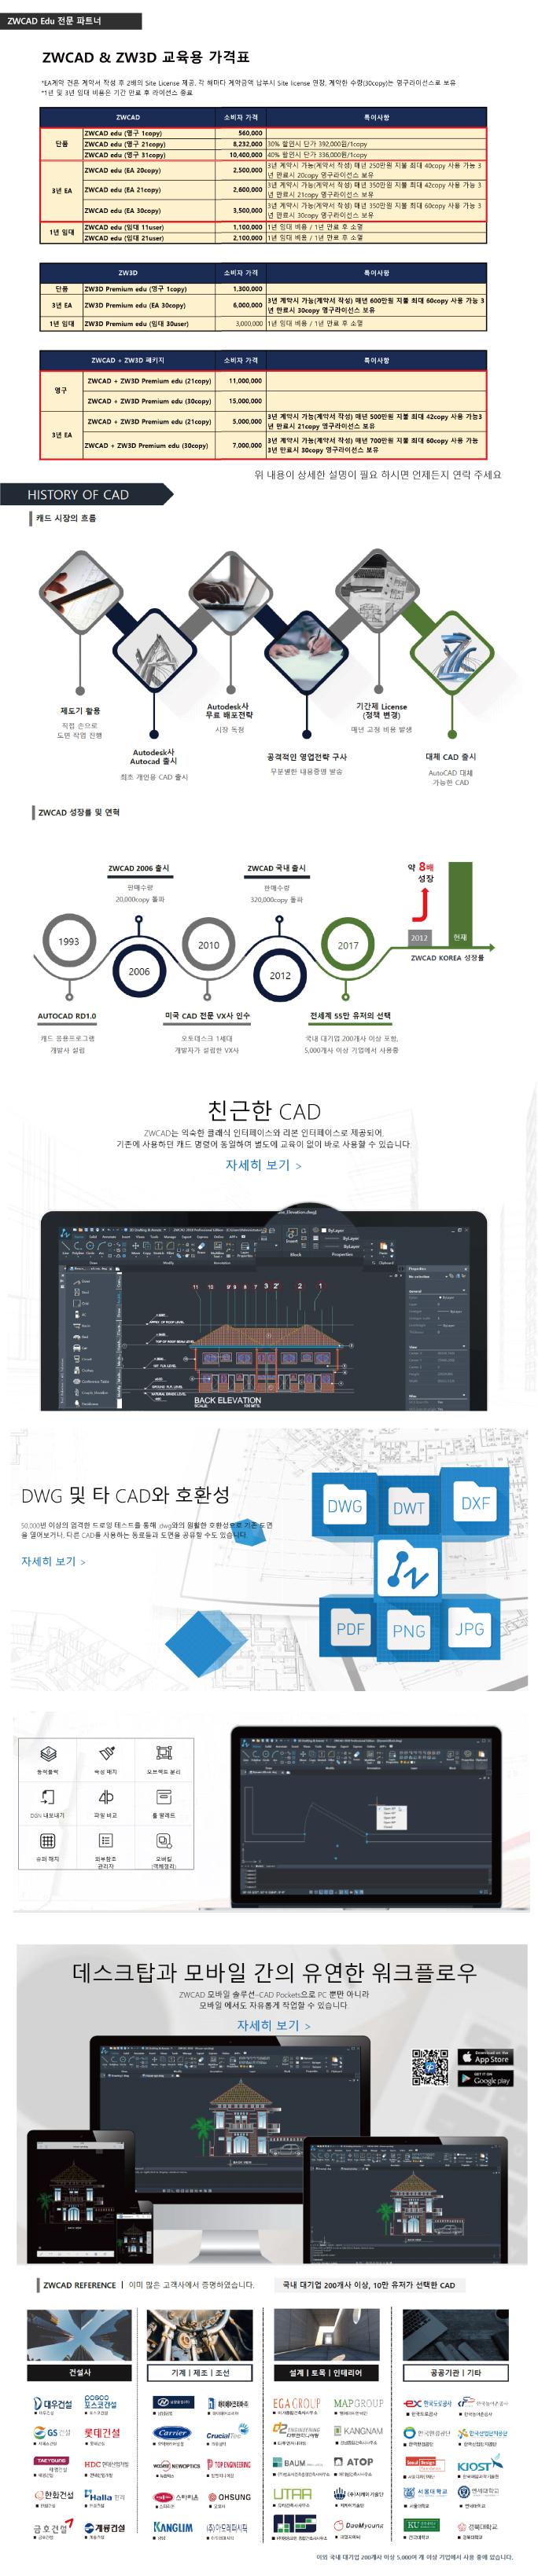 ZW3D Edu 영구버전 1copy, 3D 캐드 학원용